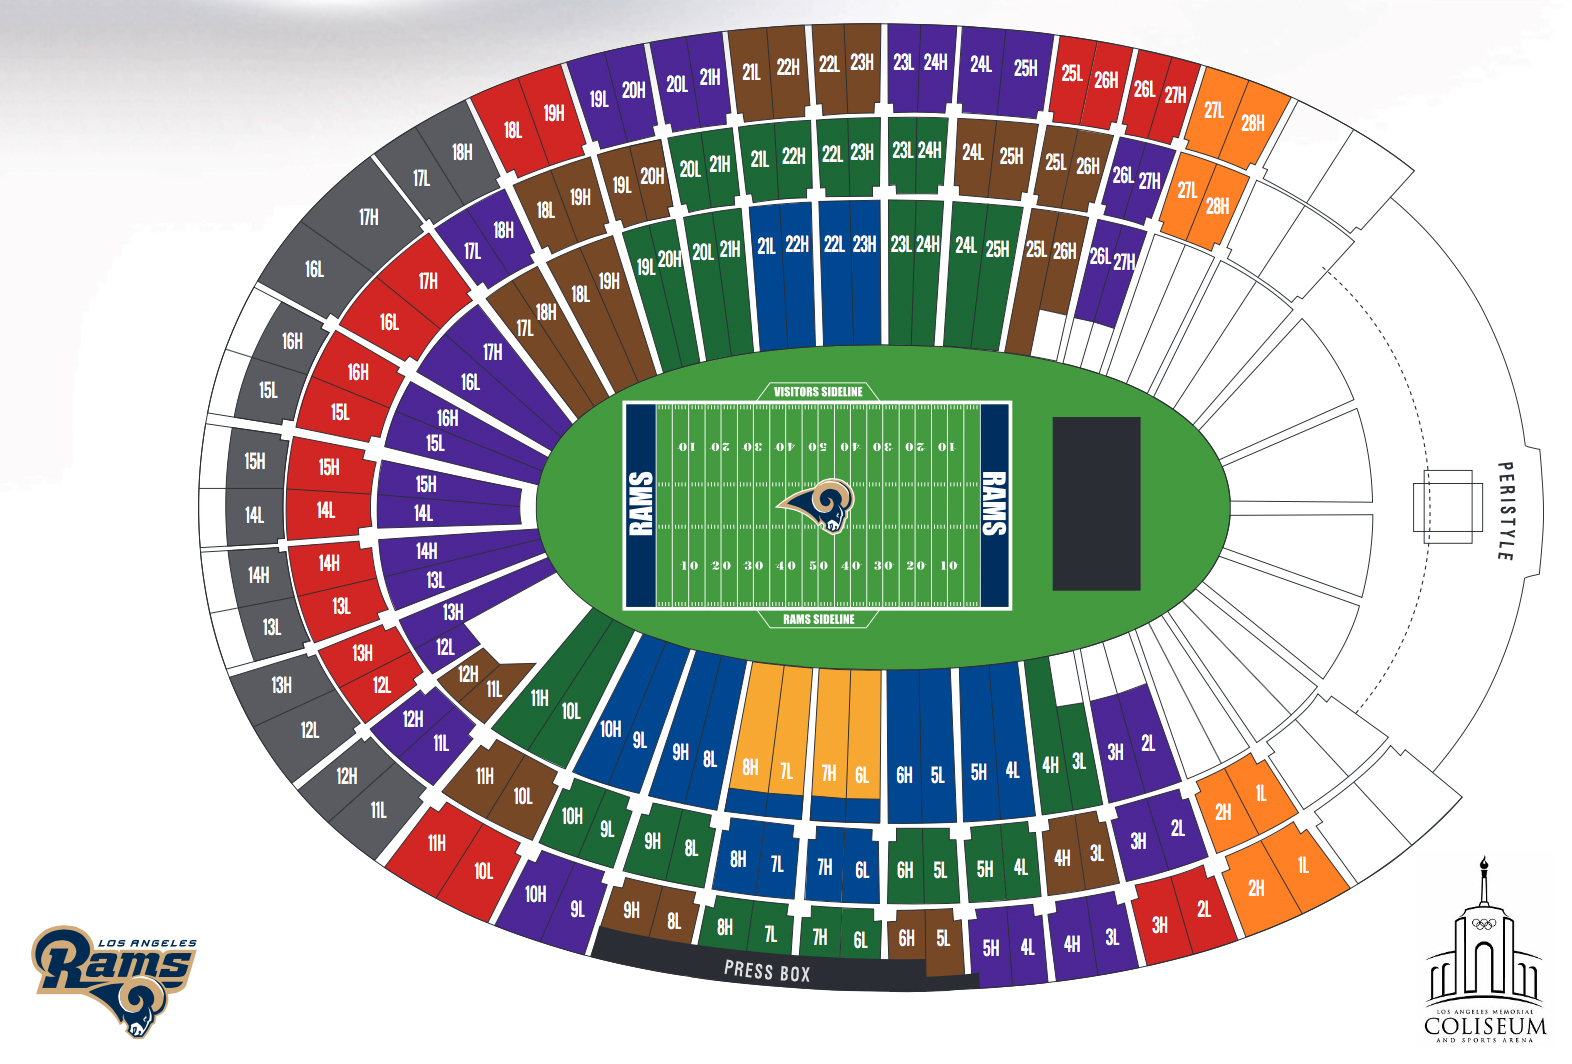 Seating Charts Stadiumsupertruck Usc Football 2017